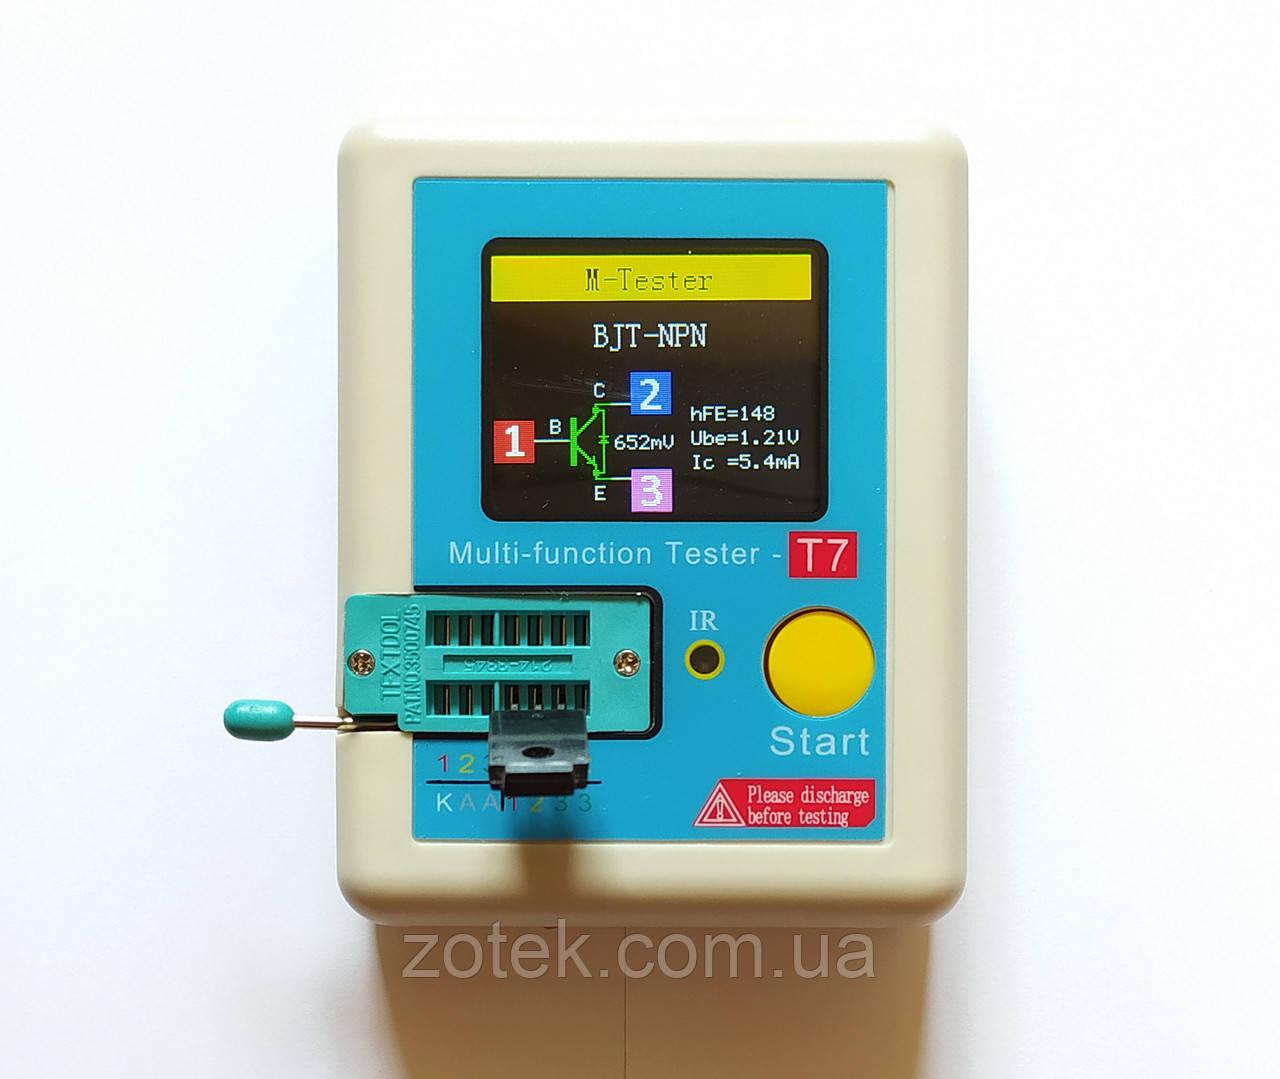 LCR-T7. Тестер электронных компонентов радиодеталей, транзисторов LCR ESR метр, транзистор тестер